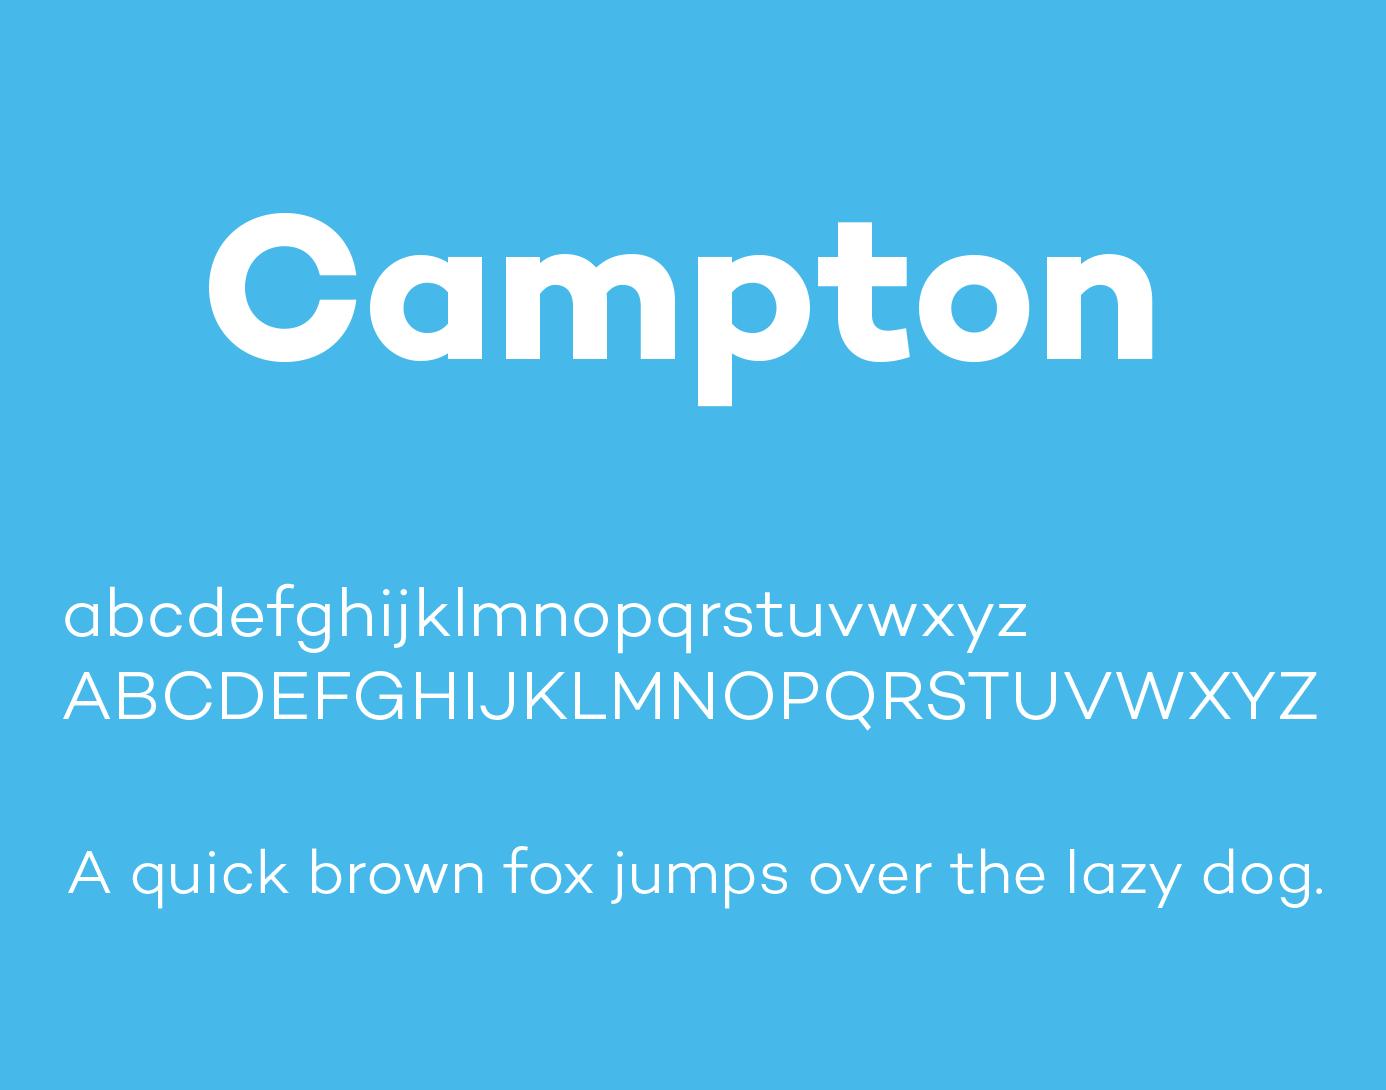 campton-font